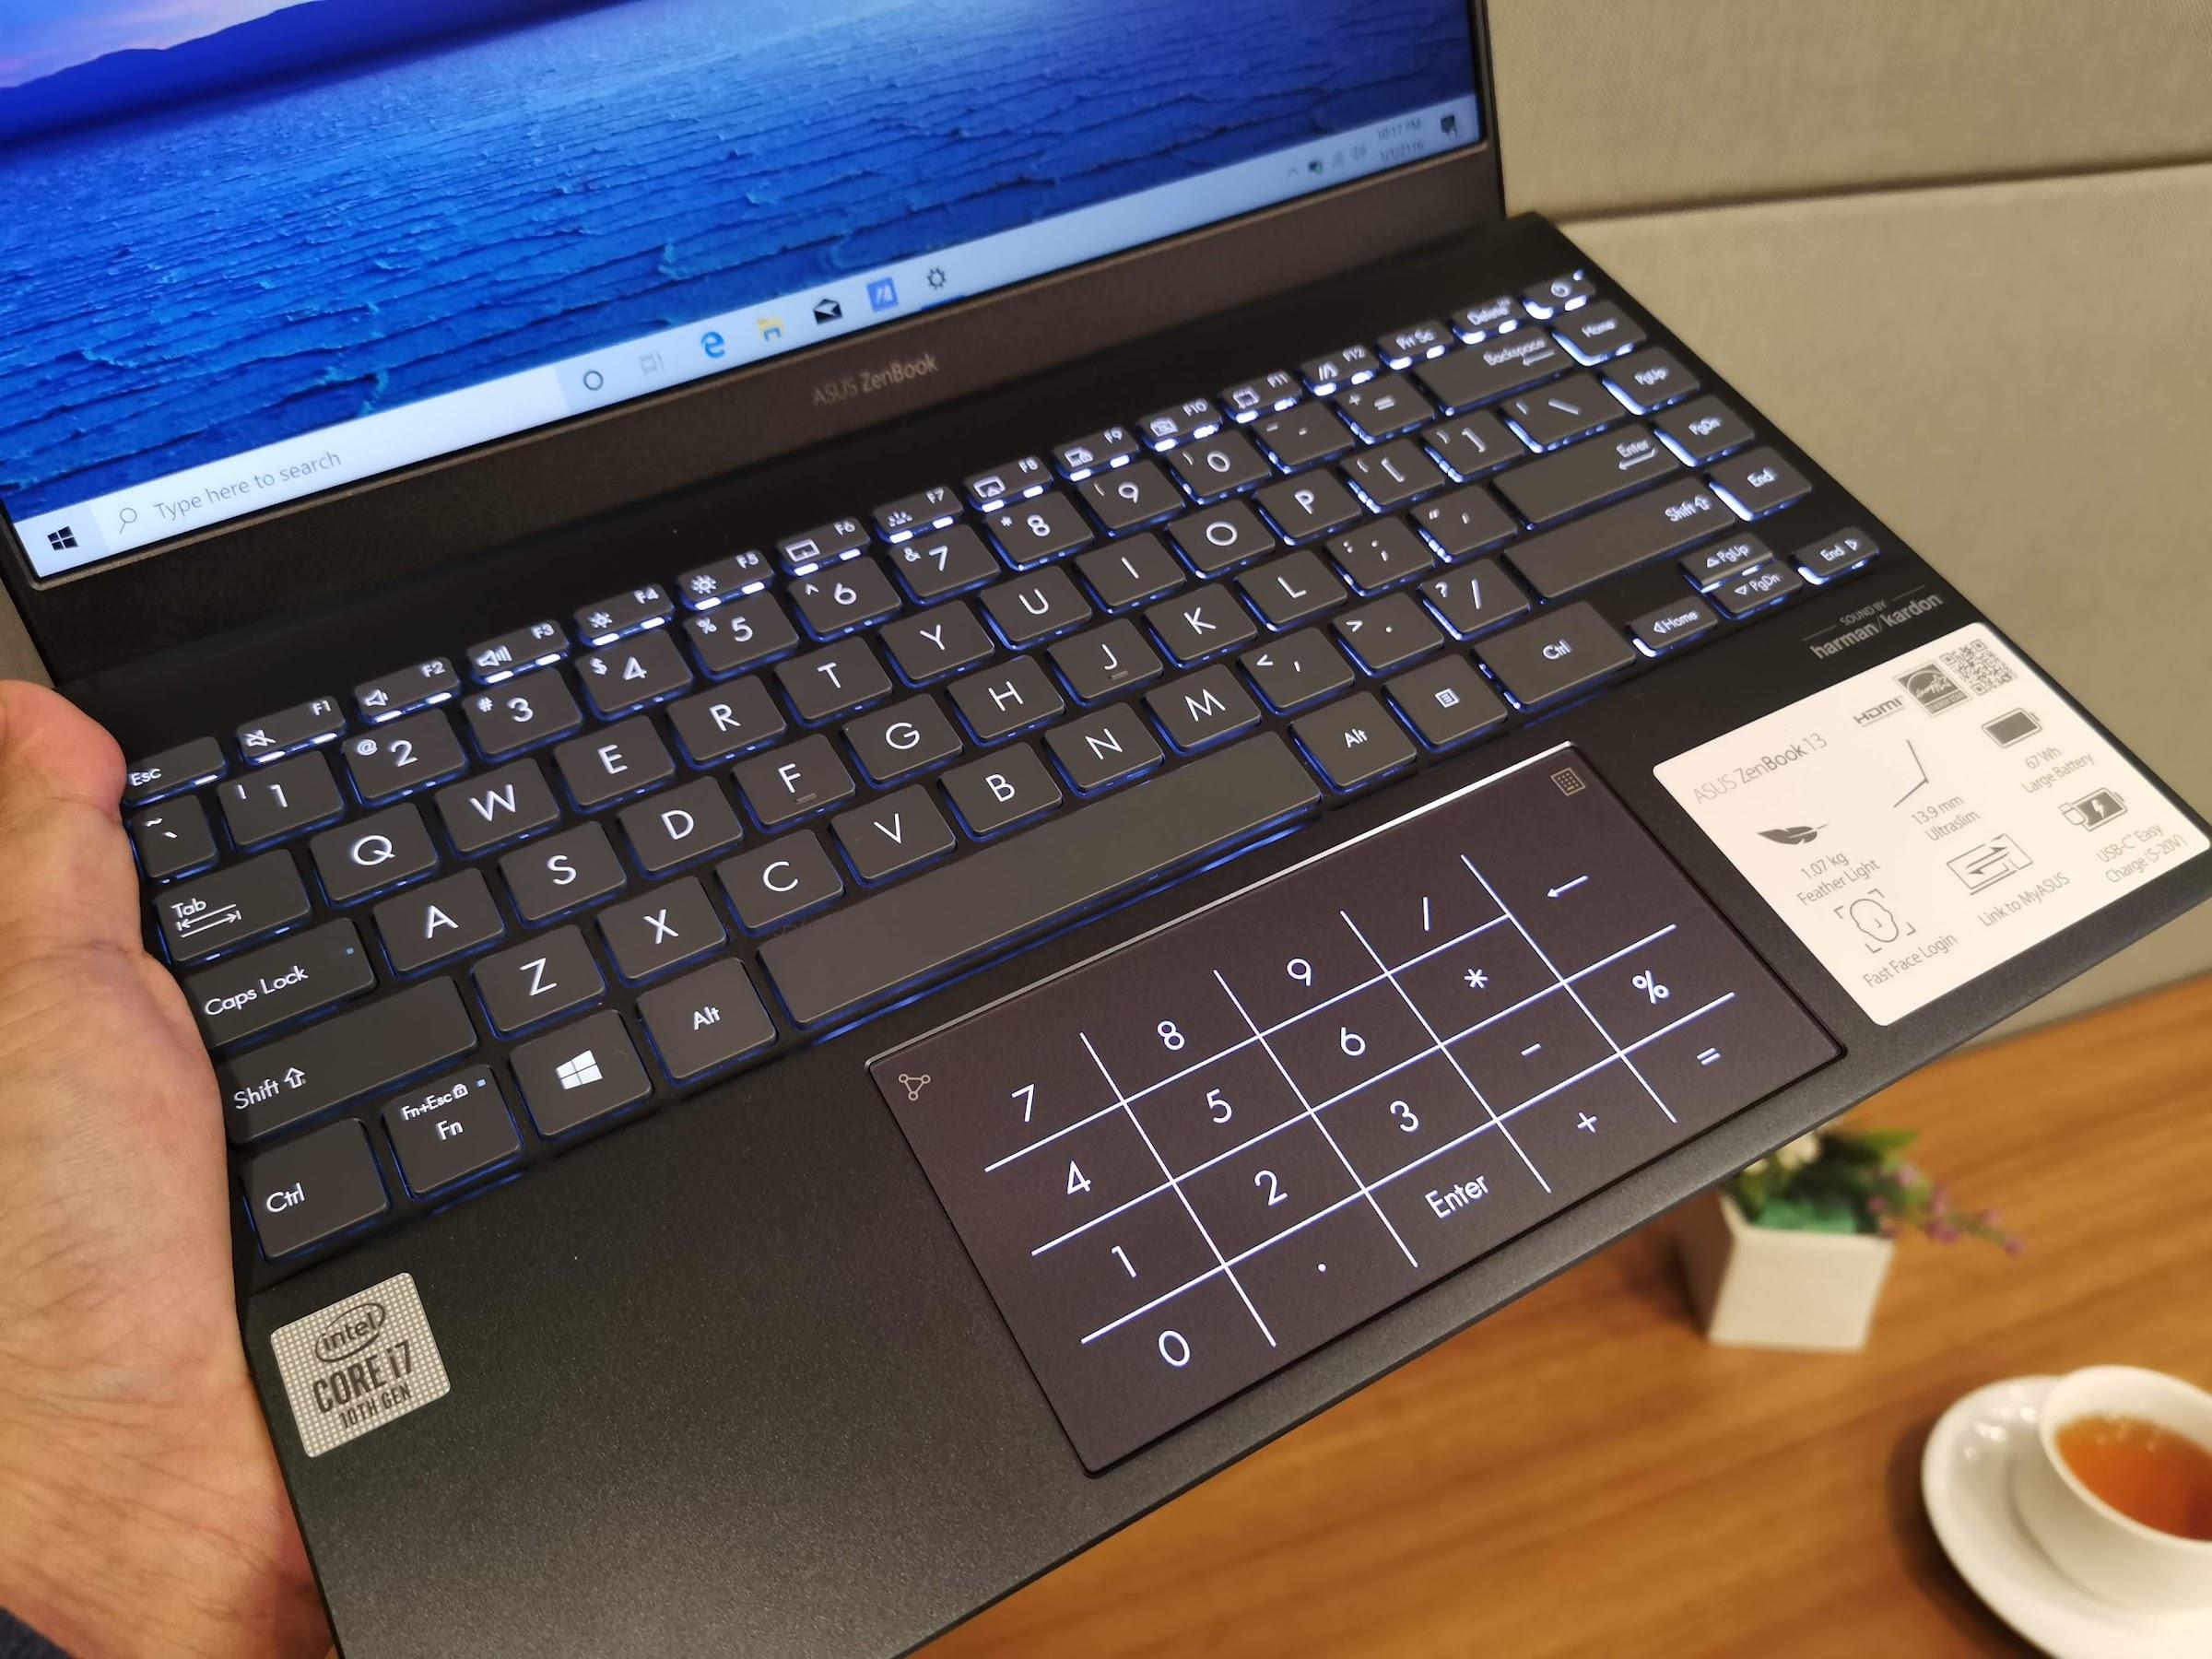 Keyboard ASUS ZenBook 13 (UX325)